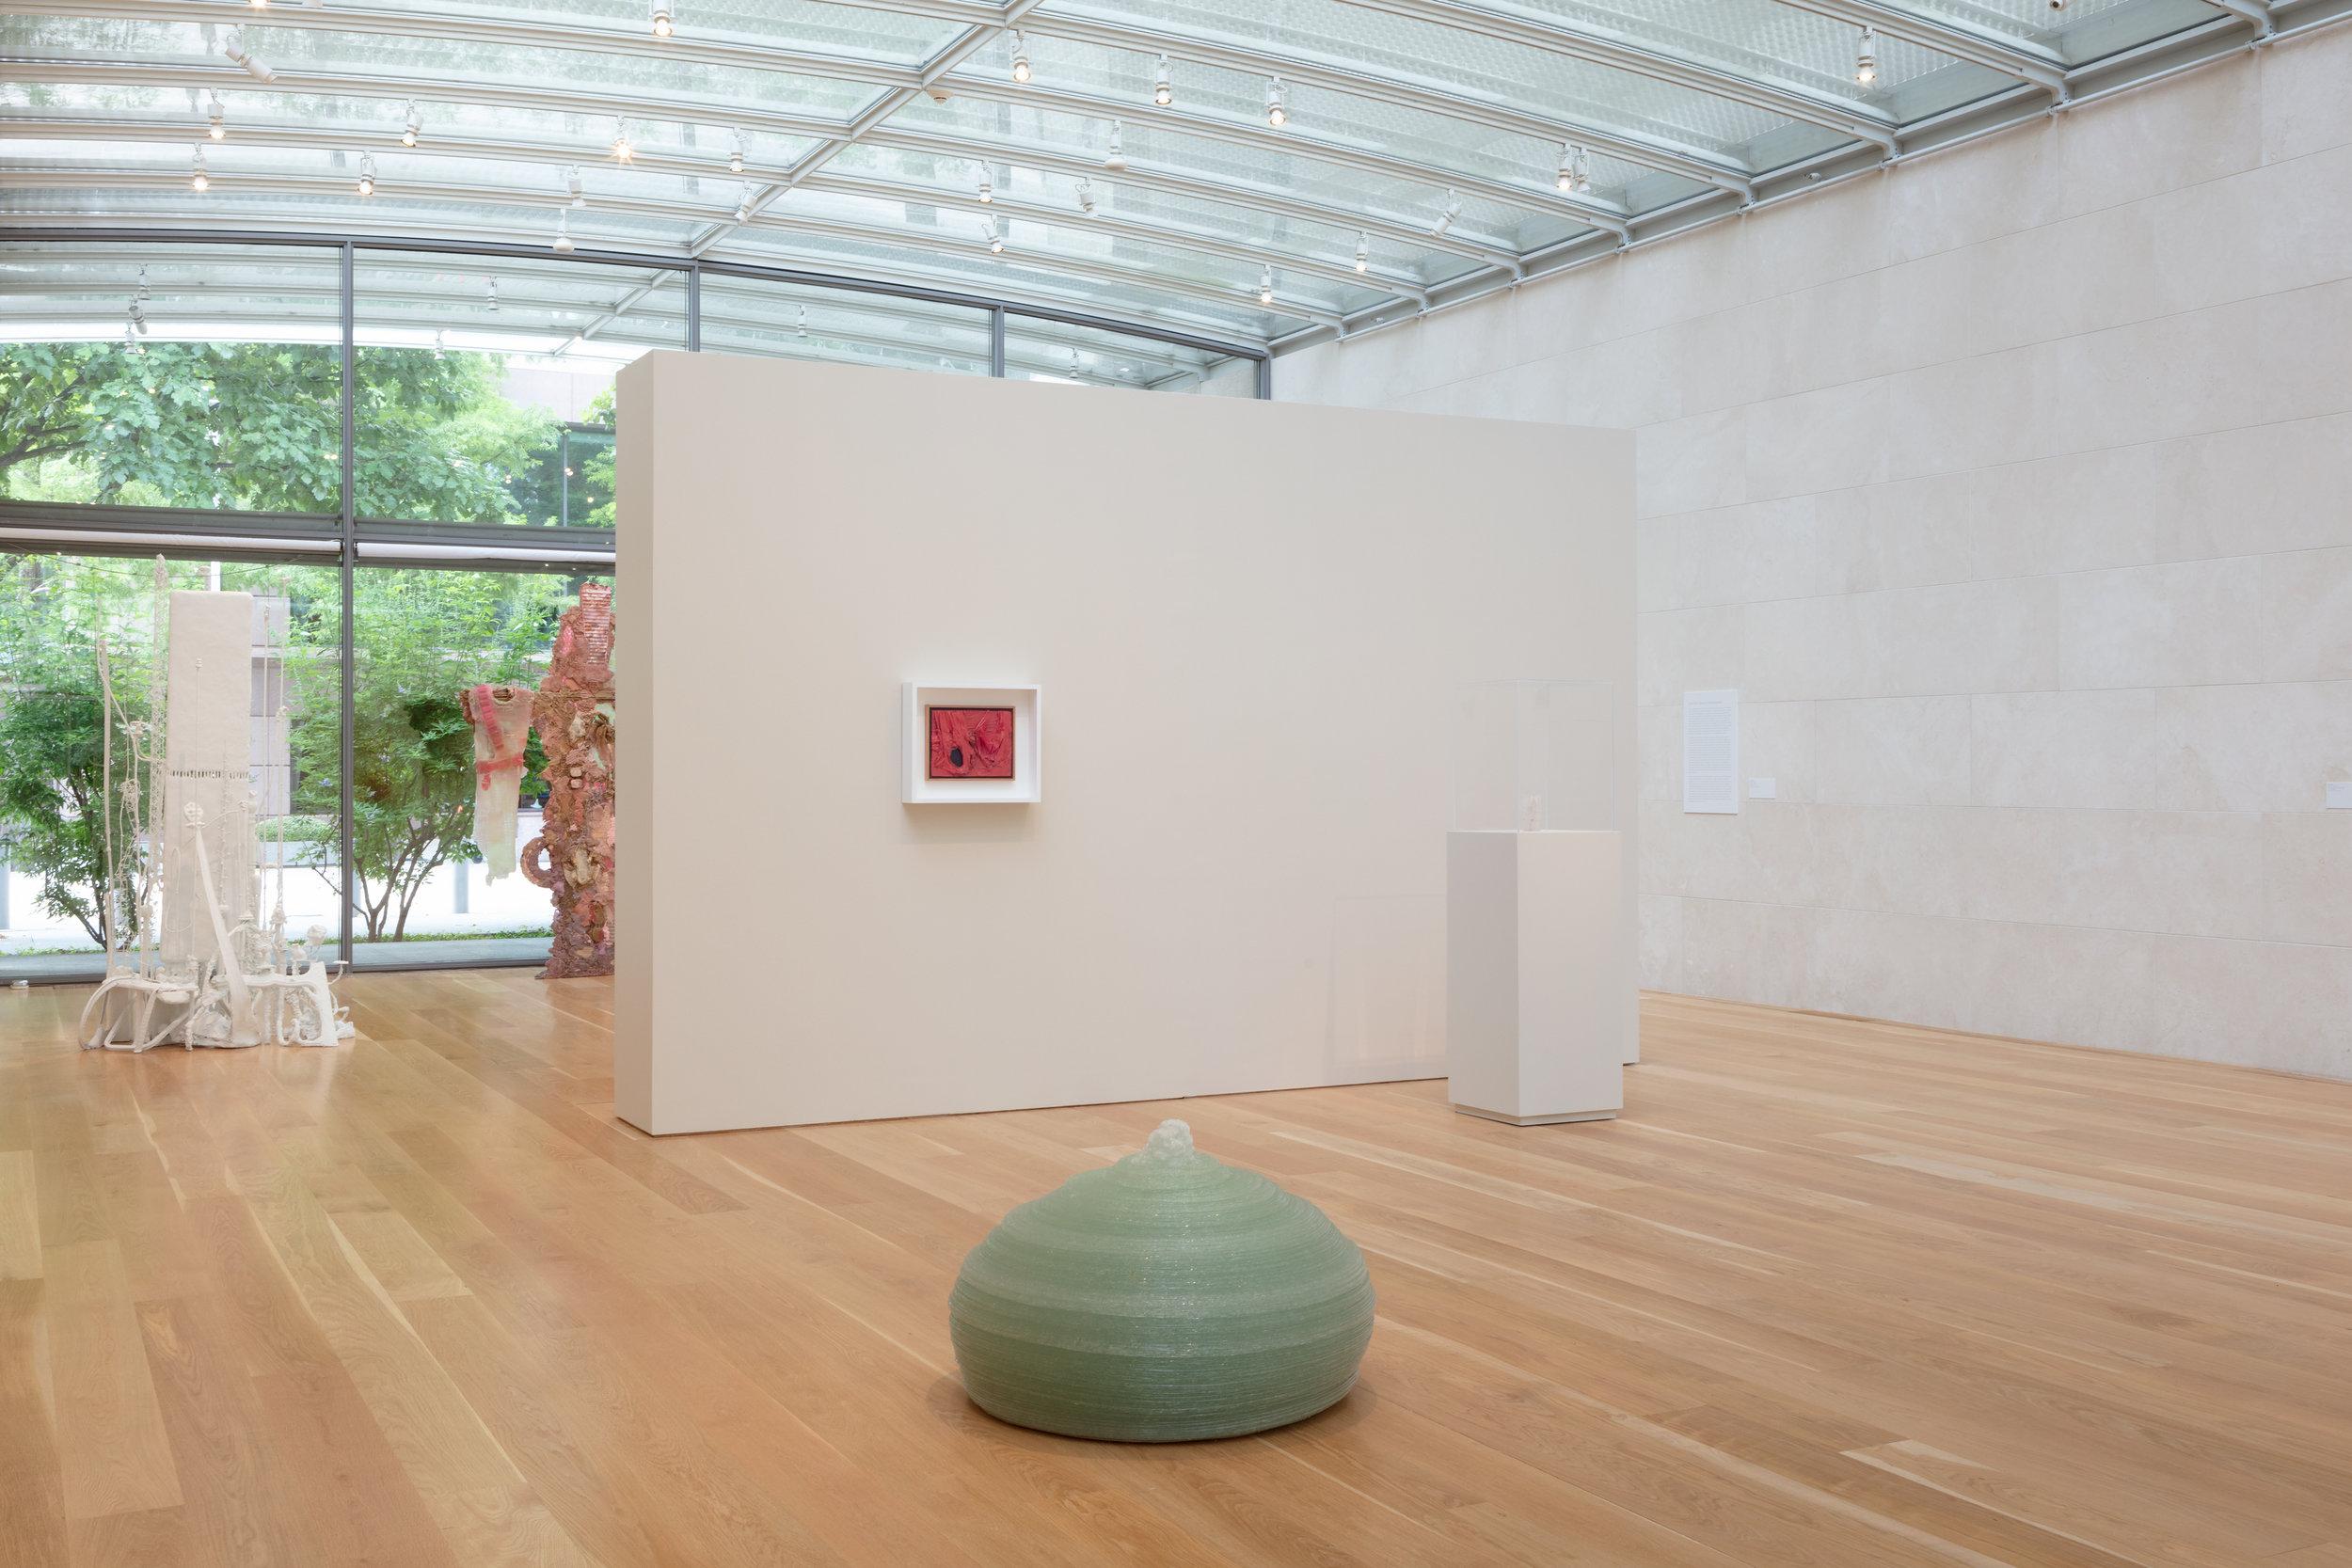 Kazuo Kadonaga,  Glass No. 4 L , 1999, Glass. (1477 lbs. / 670 kg.), 24-1/4 x 39 x 39 inches, 62 x 99 x 99 cm